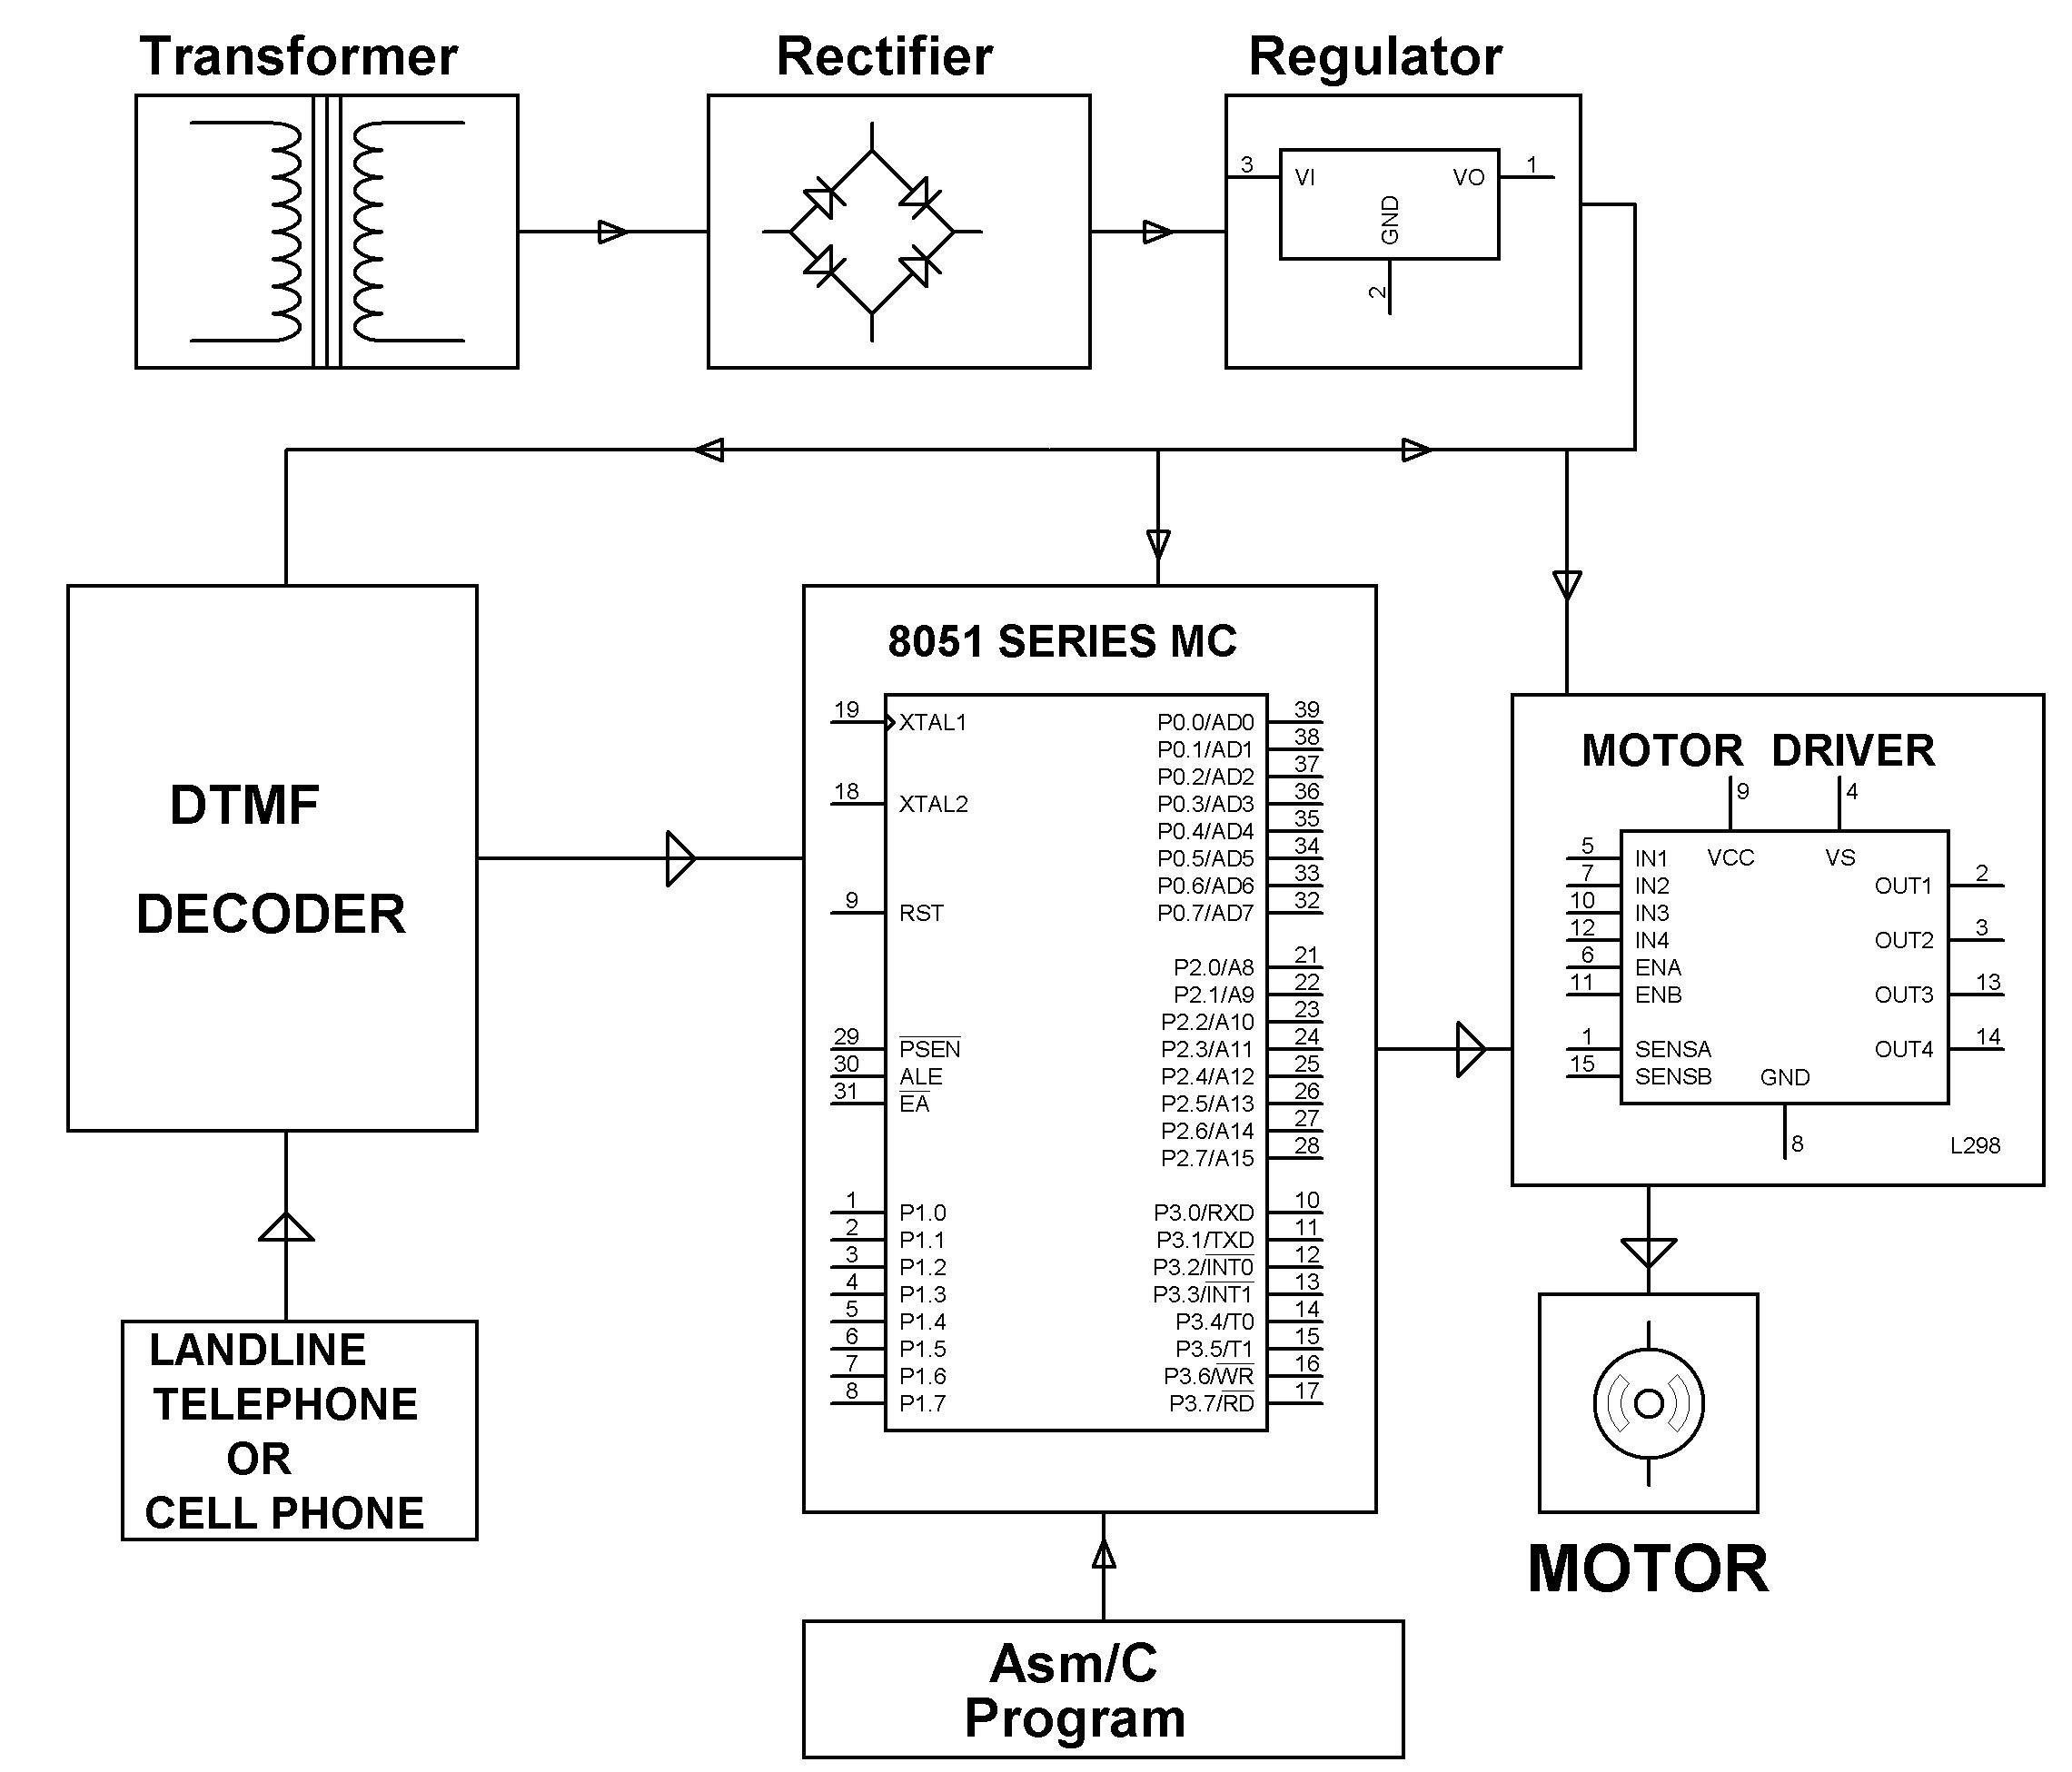 medium resolution of garage door opener control diagrams wiring diagram expert block diagram of dtmf control based automatic garage